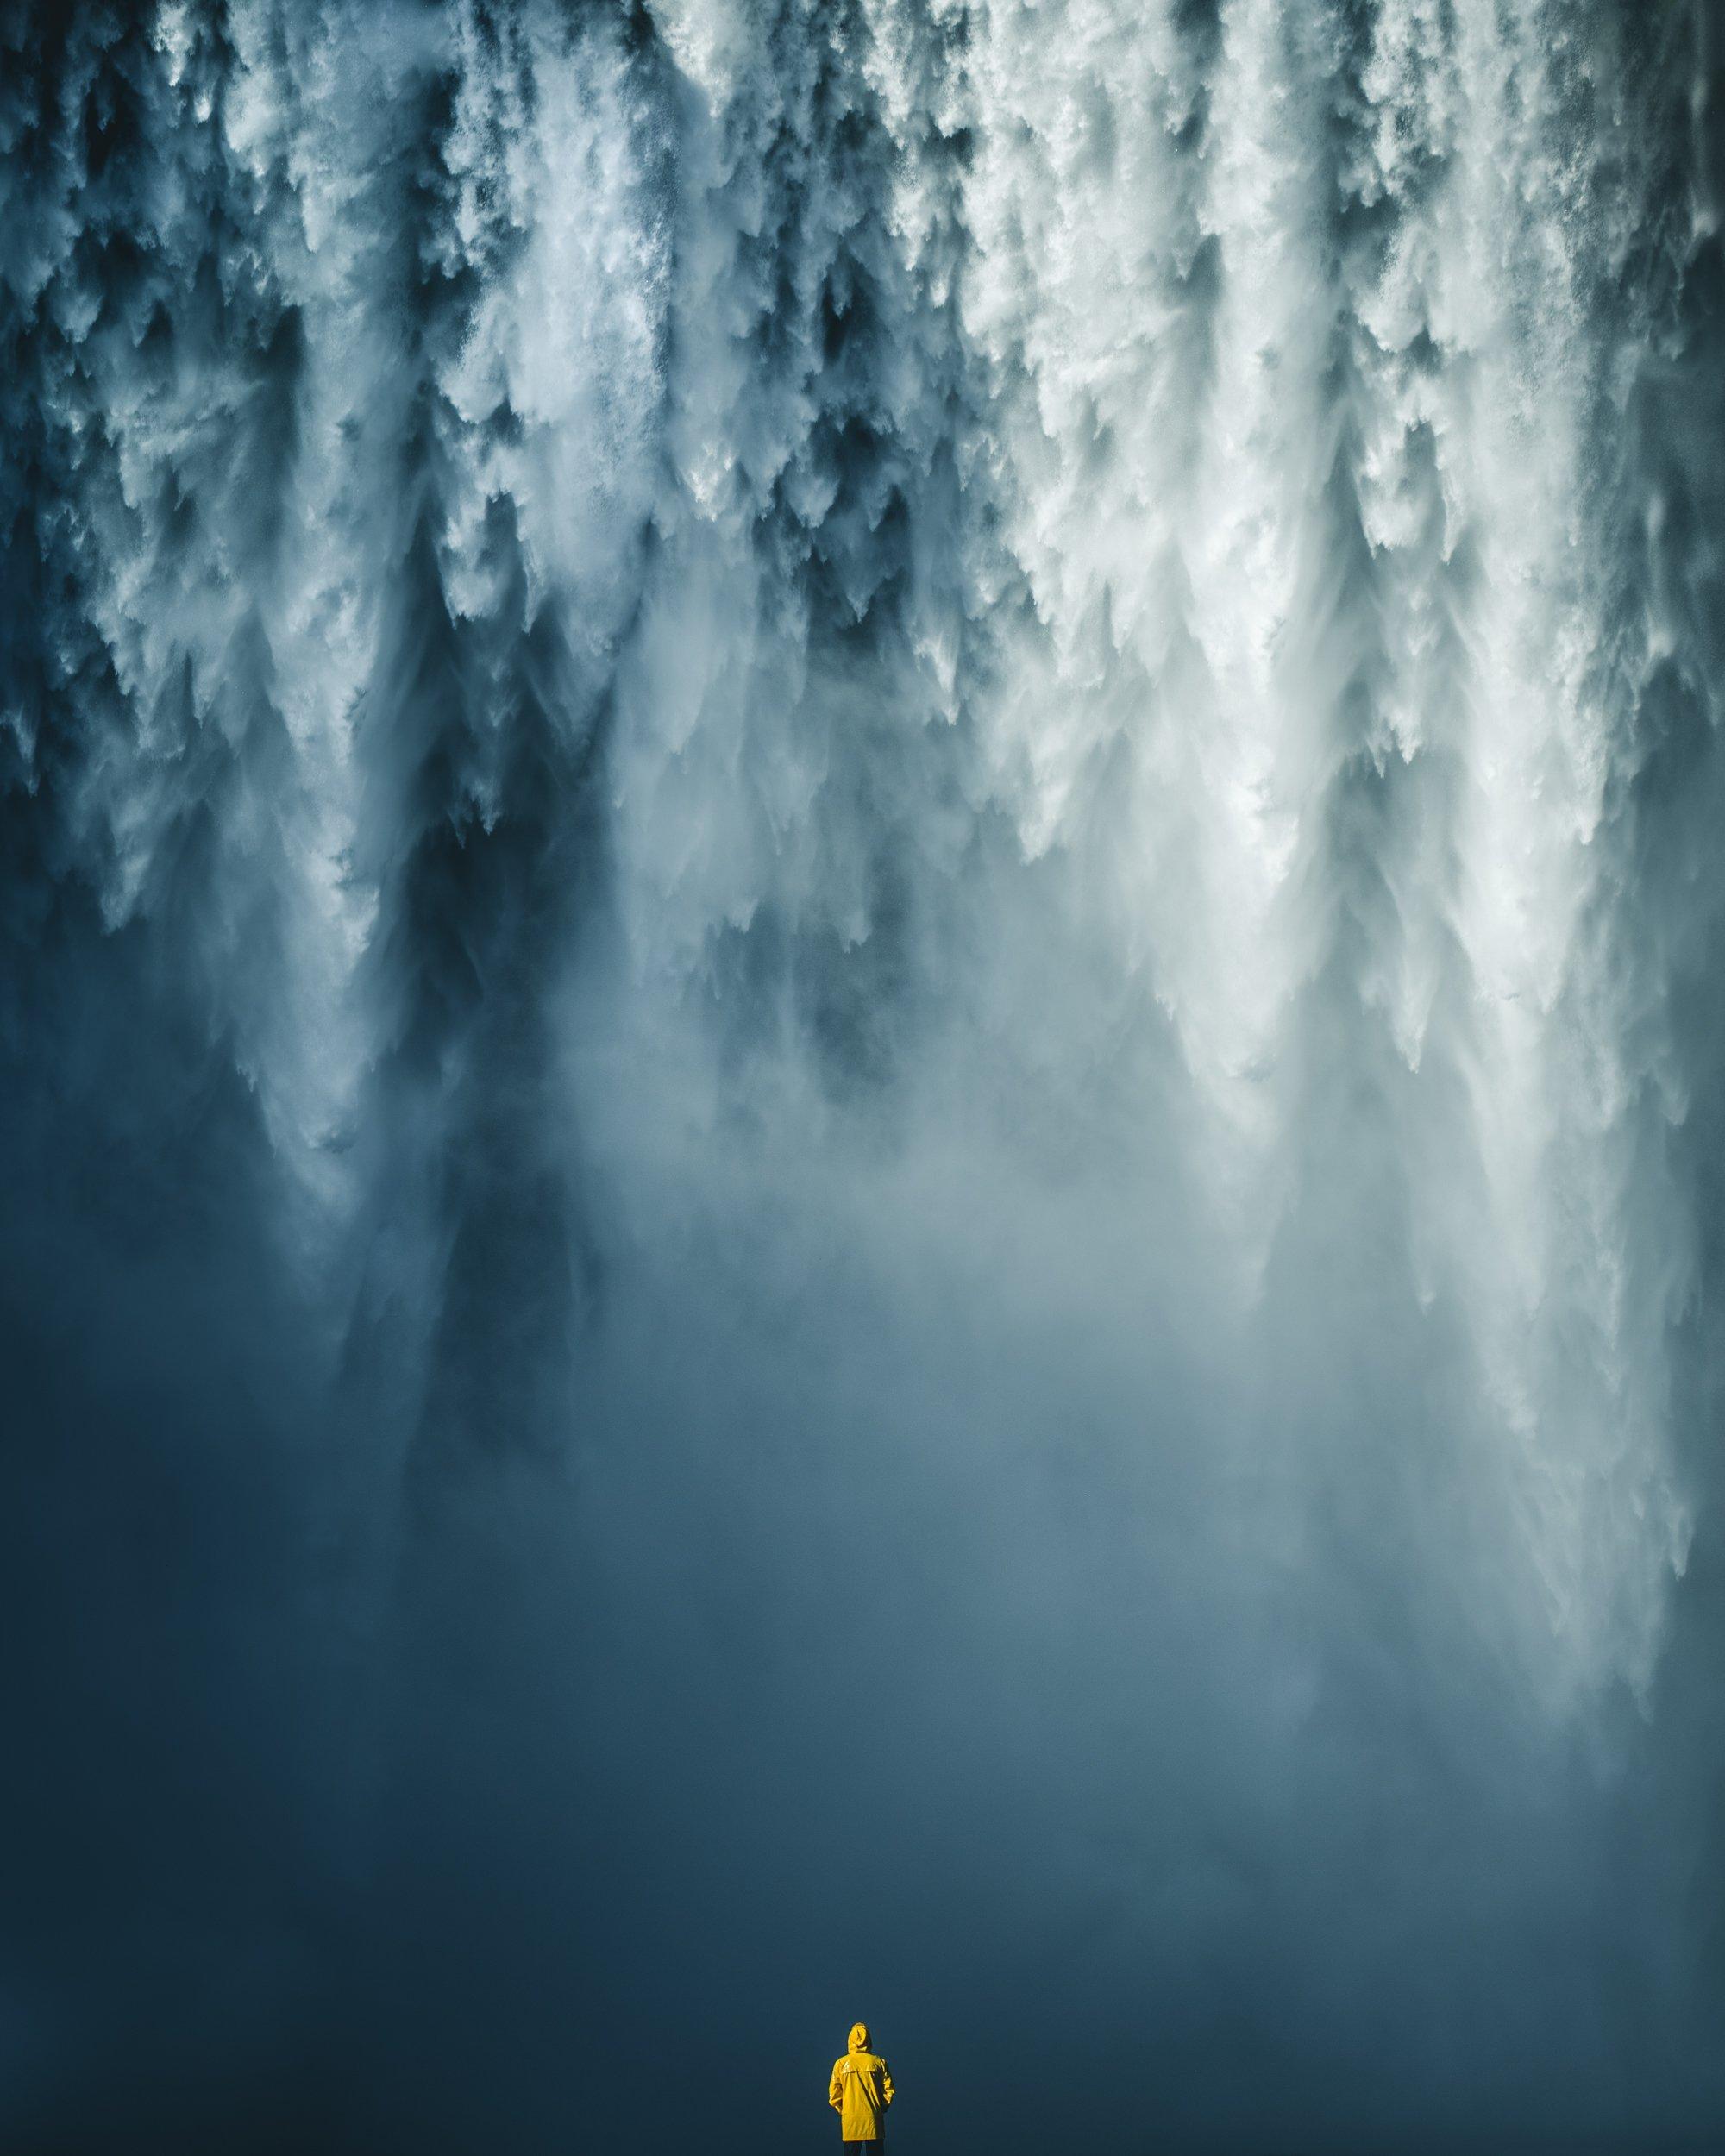 waterfall, iceland, skogafoss, nature, travel, outdoor, Ziomek Witold